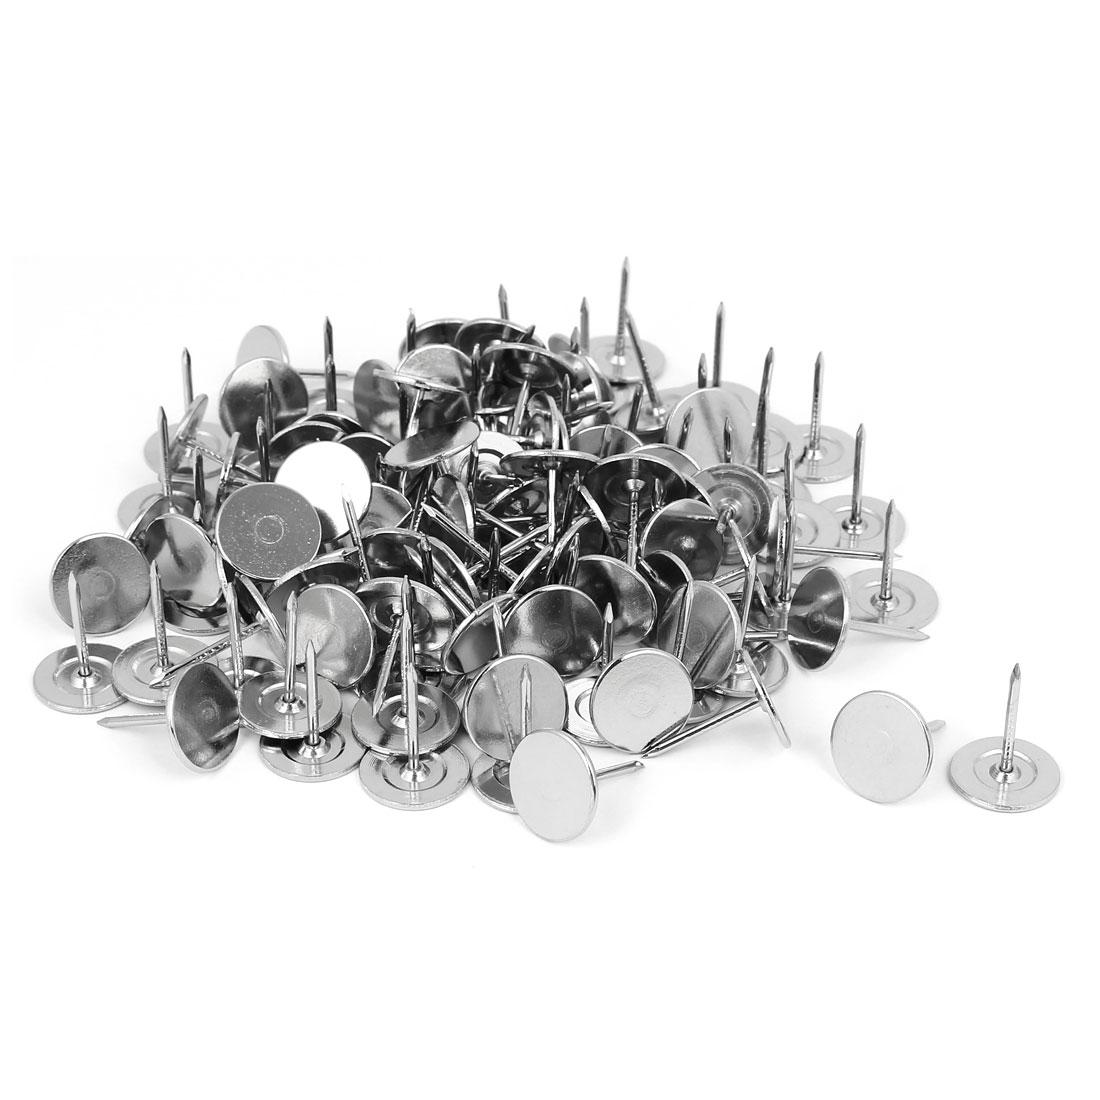 Furniture Metal Round Flat Head Upholstery Tack Nail Silver Tone 15mm Dia 120pcs